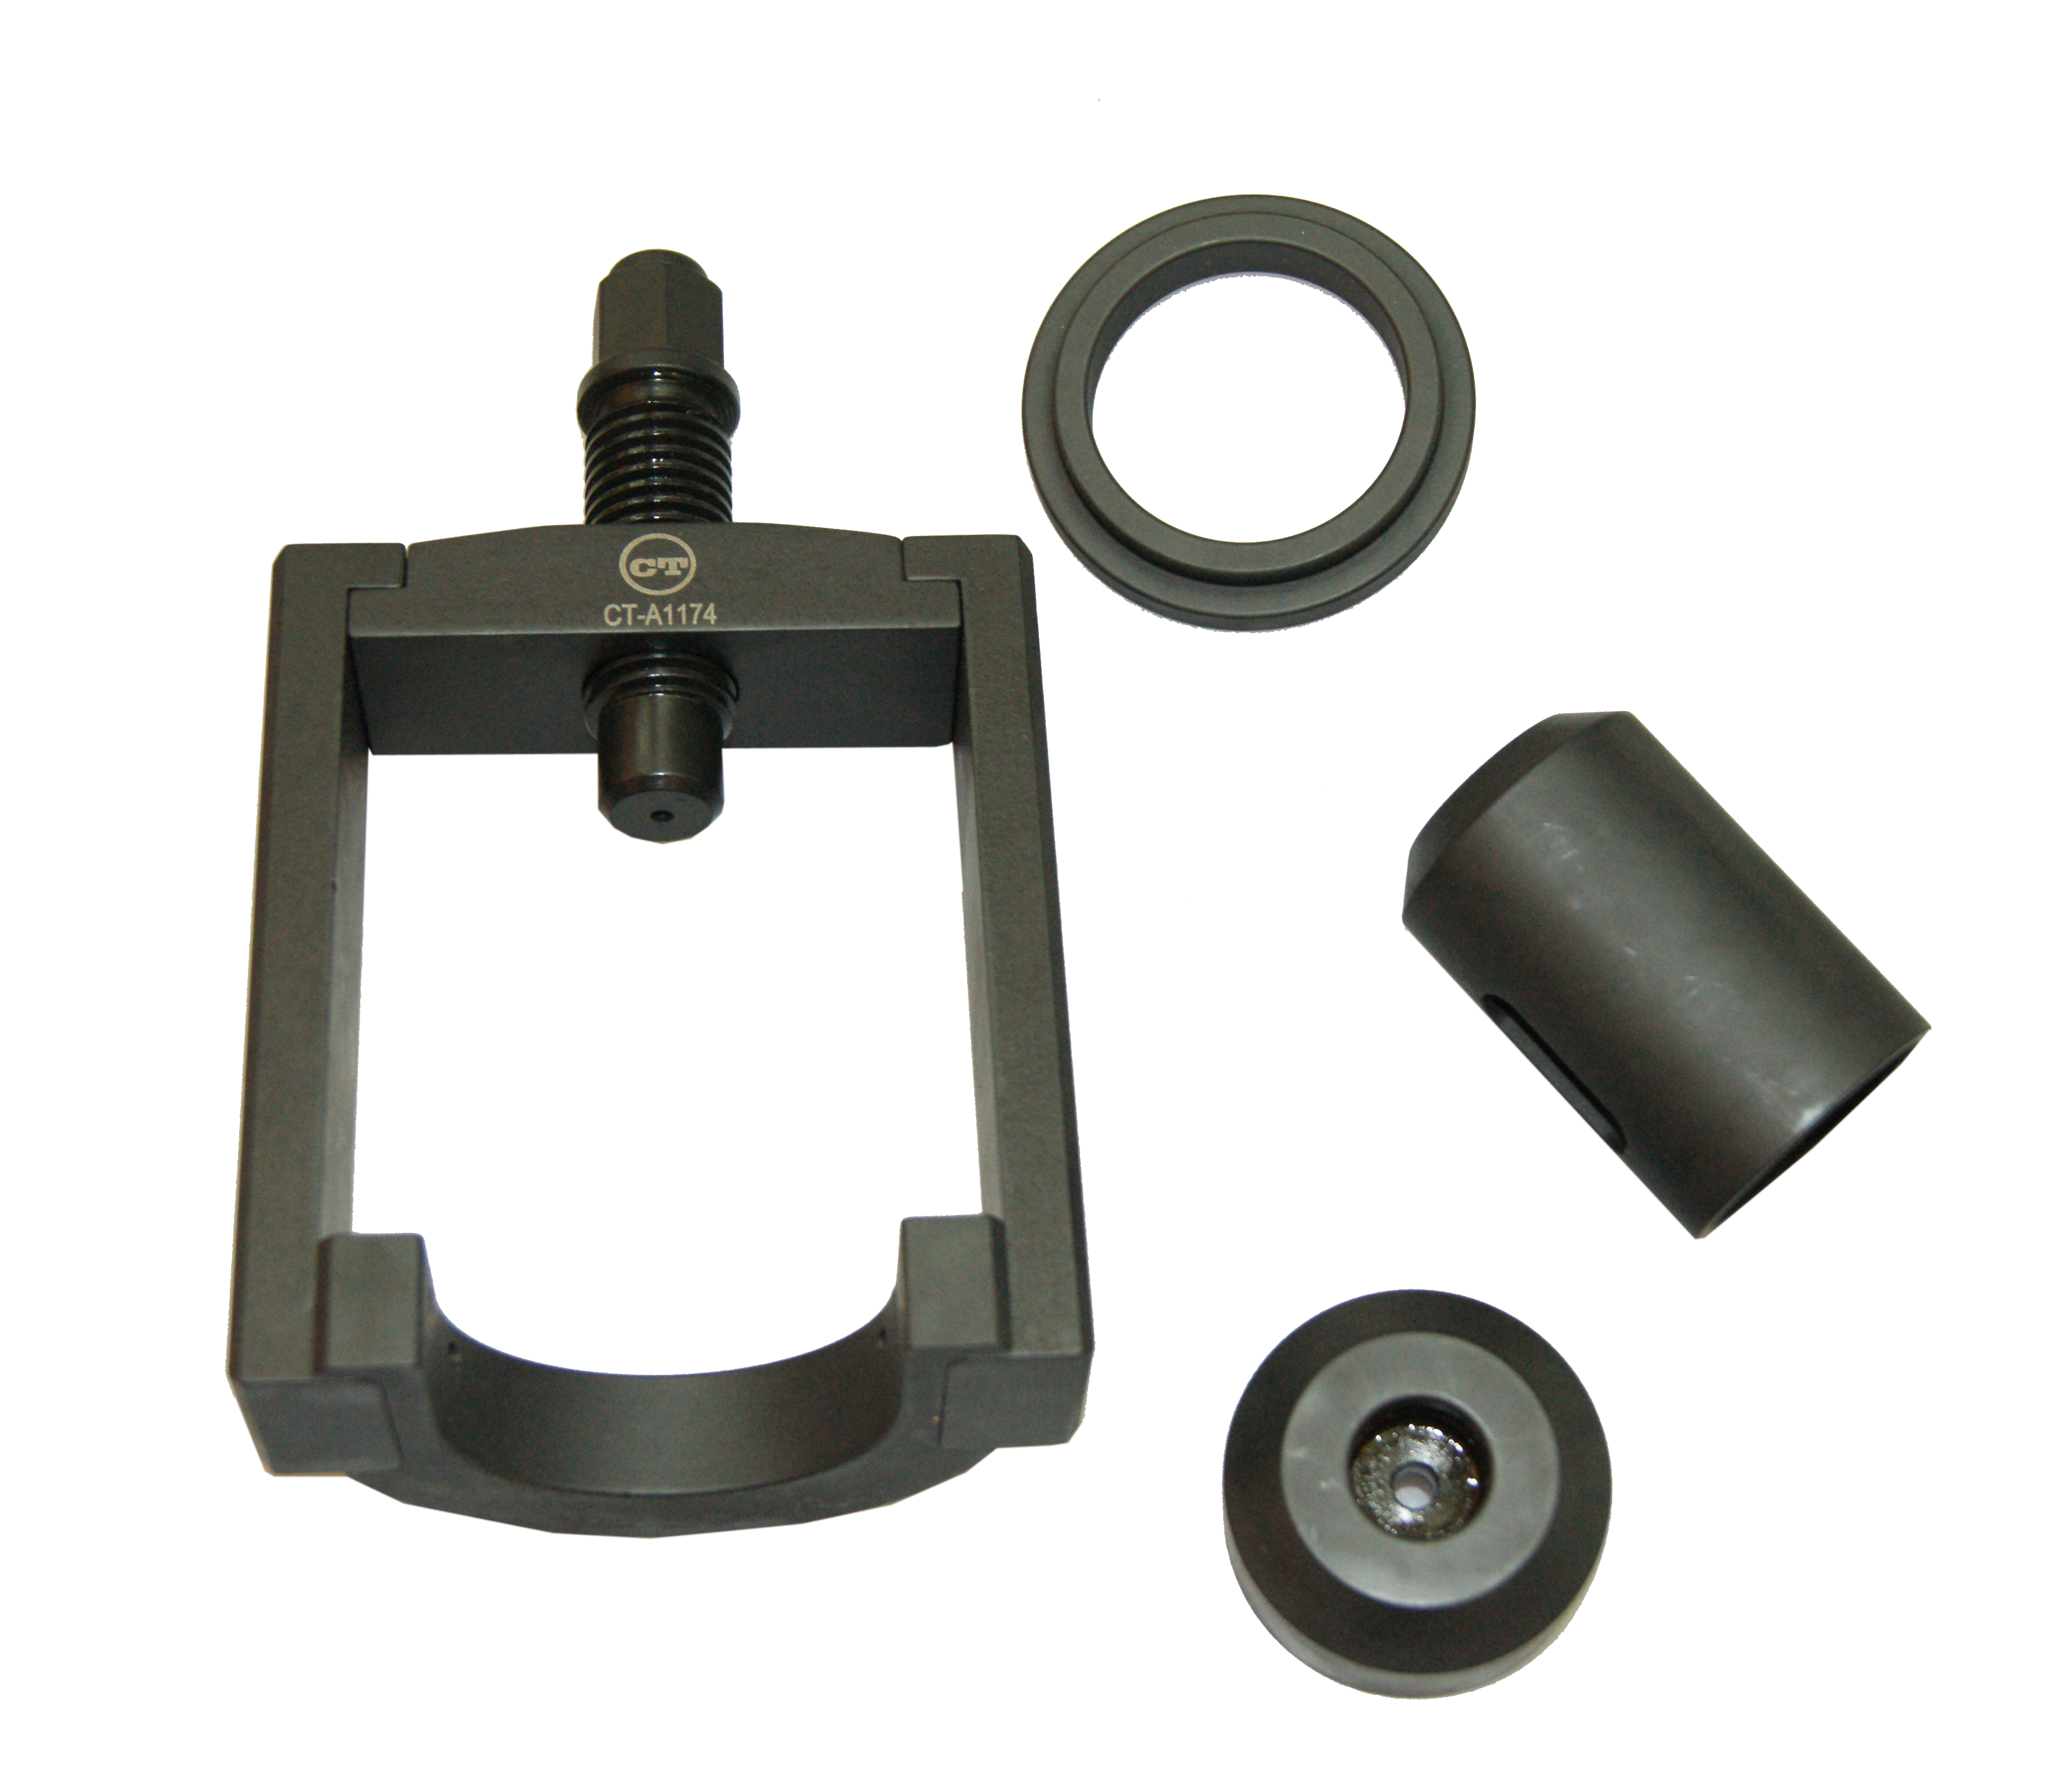 Съемник шаровой опоры W124 Car-Tool CT-A1174